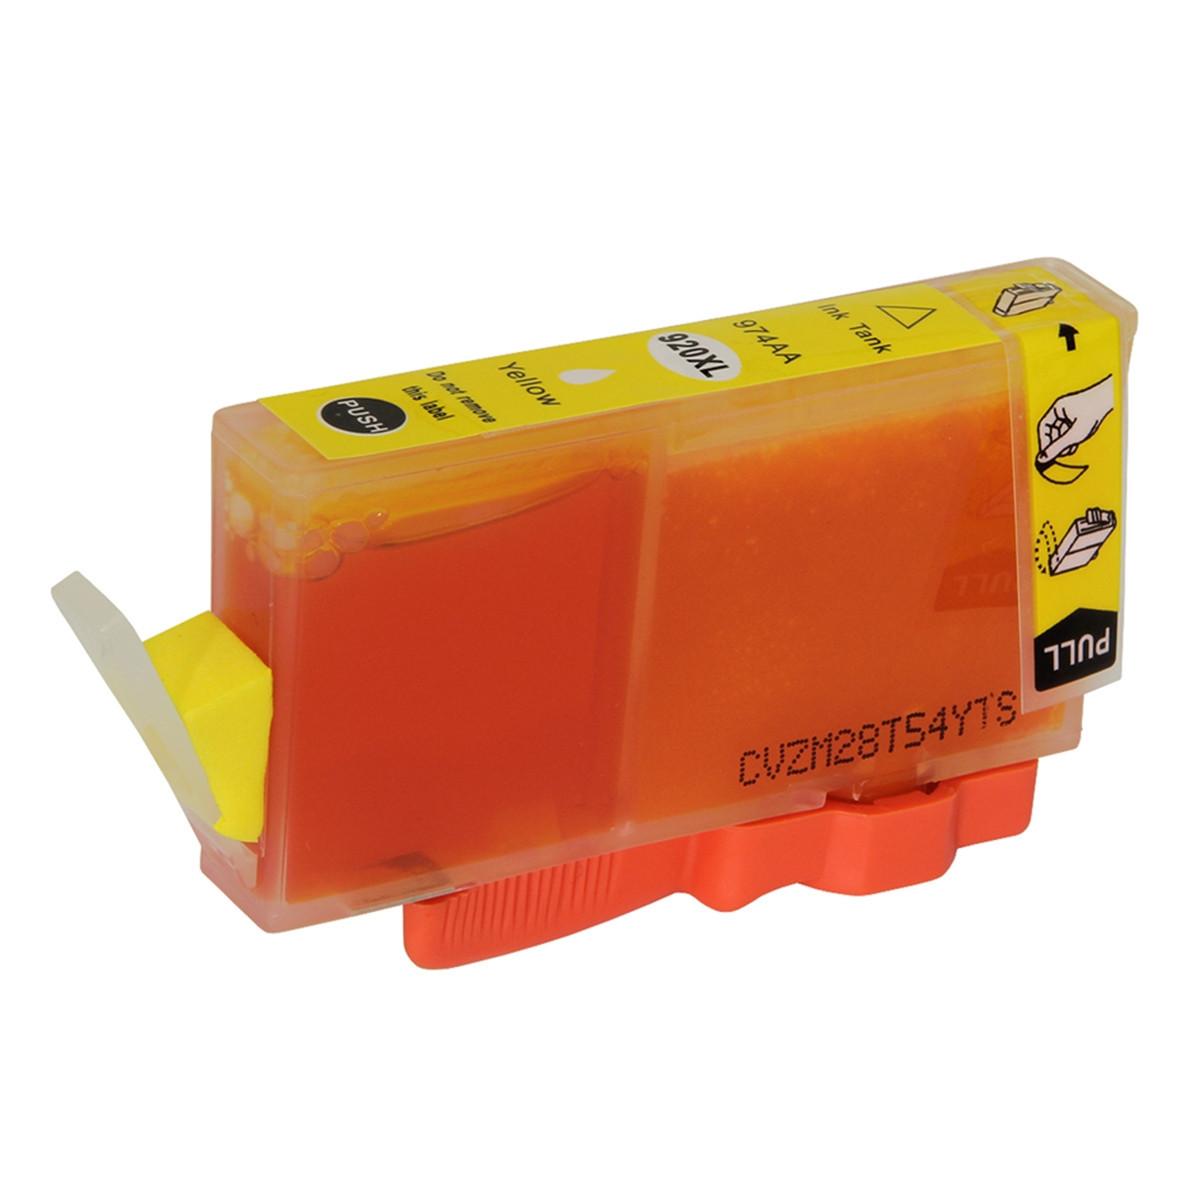 Cartucho de Tinta Compatível com HP 920XL 920 CD974AL Amarelo | 6500 Officejet 6000 E709 | 13ml